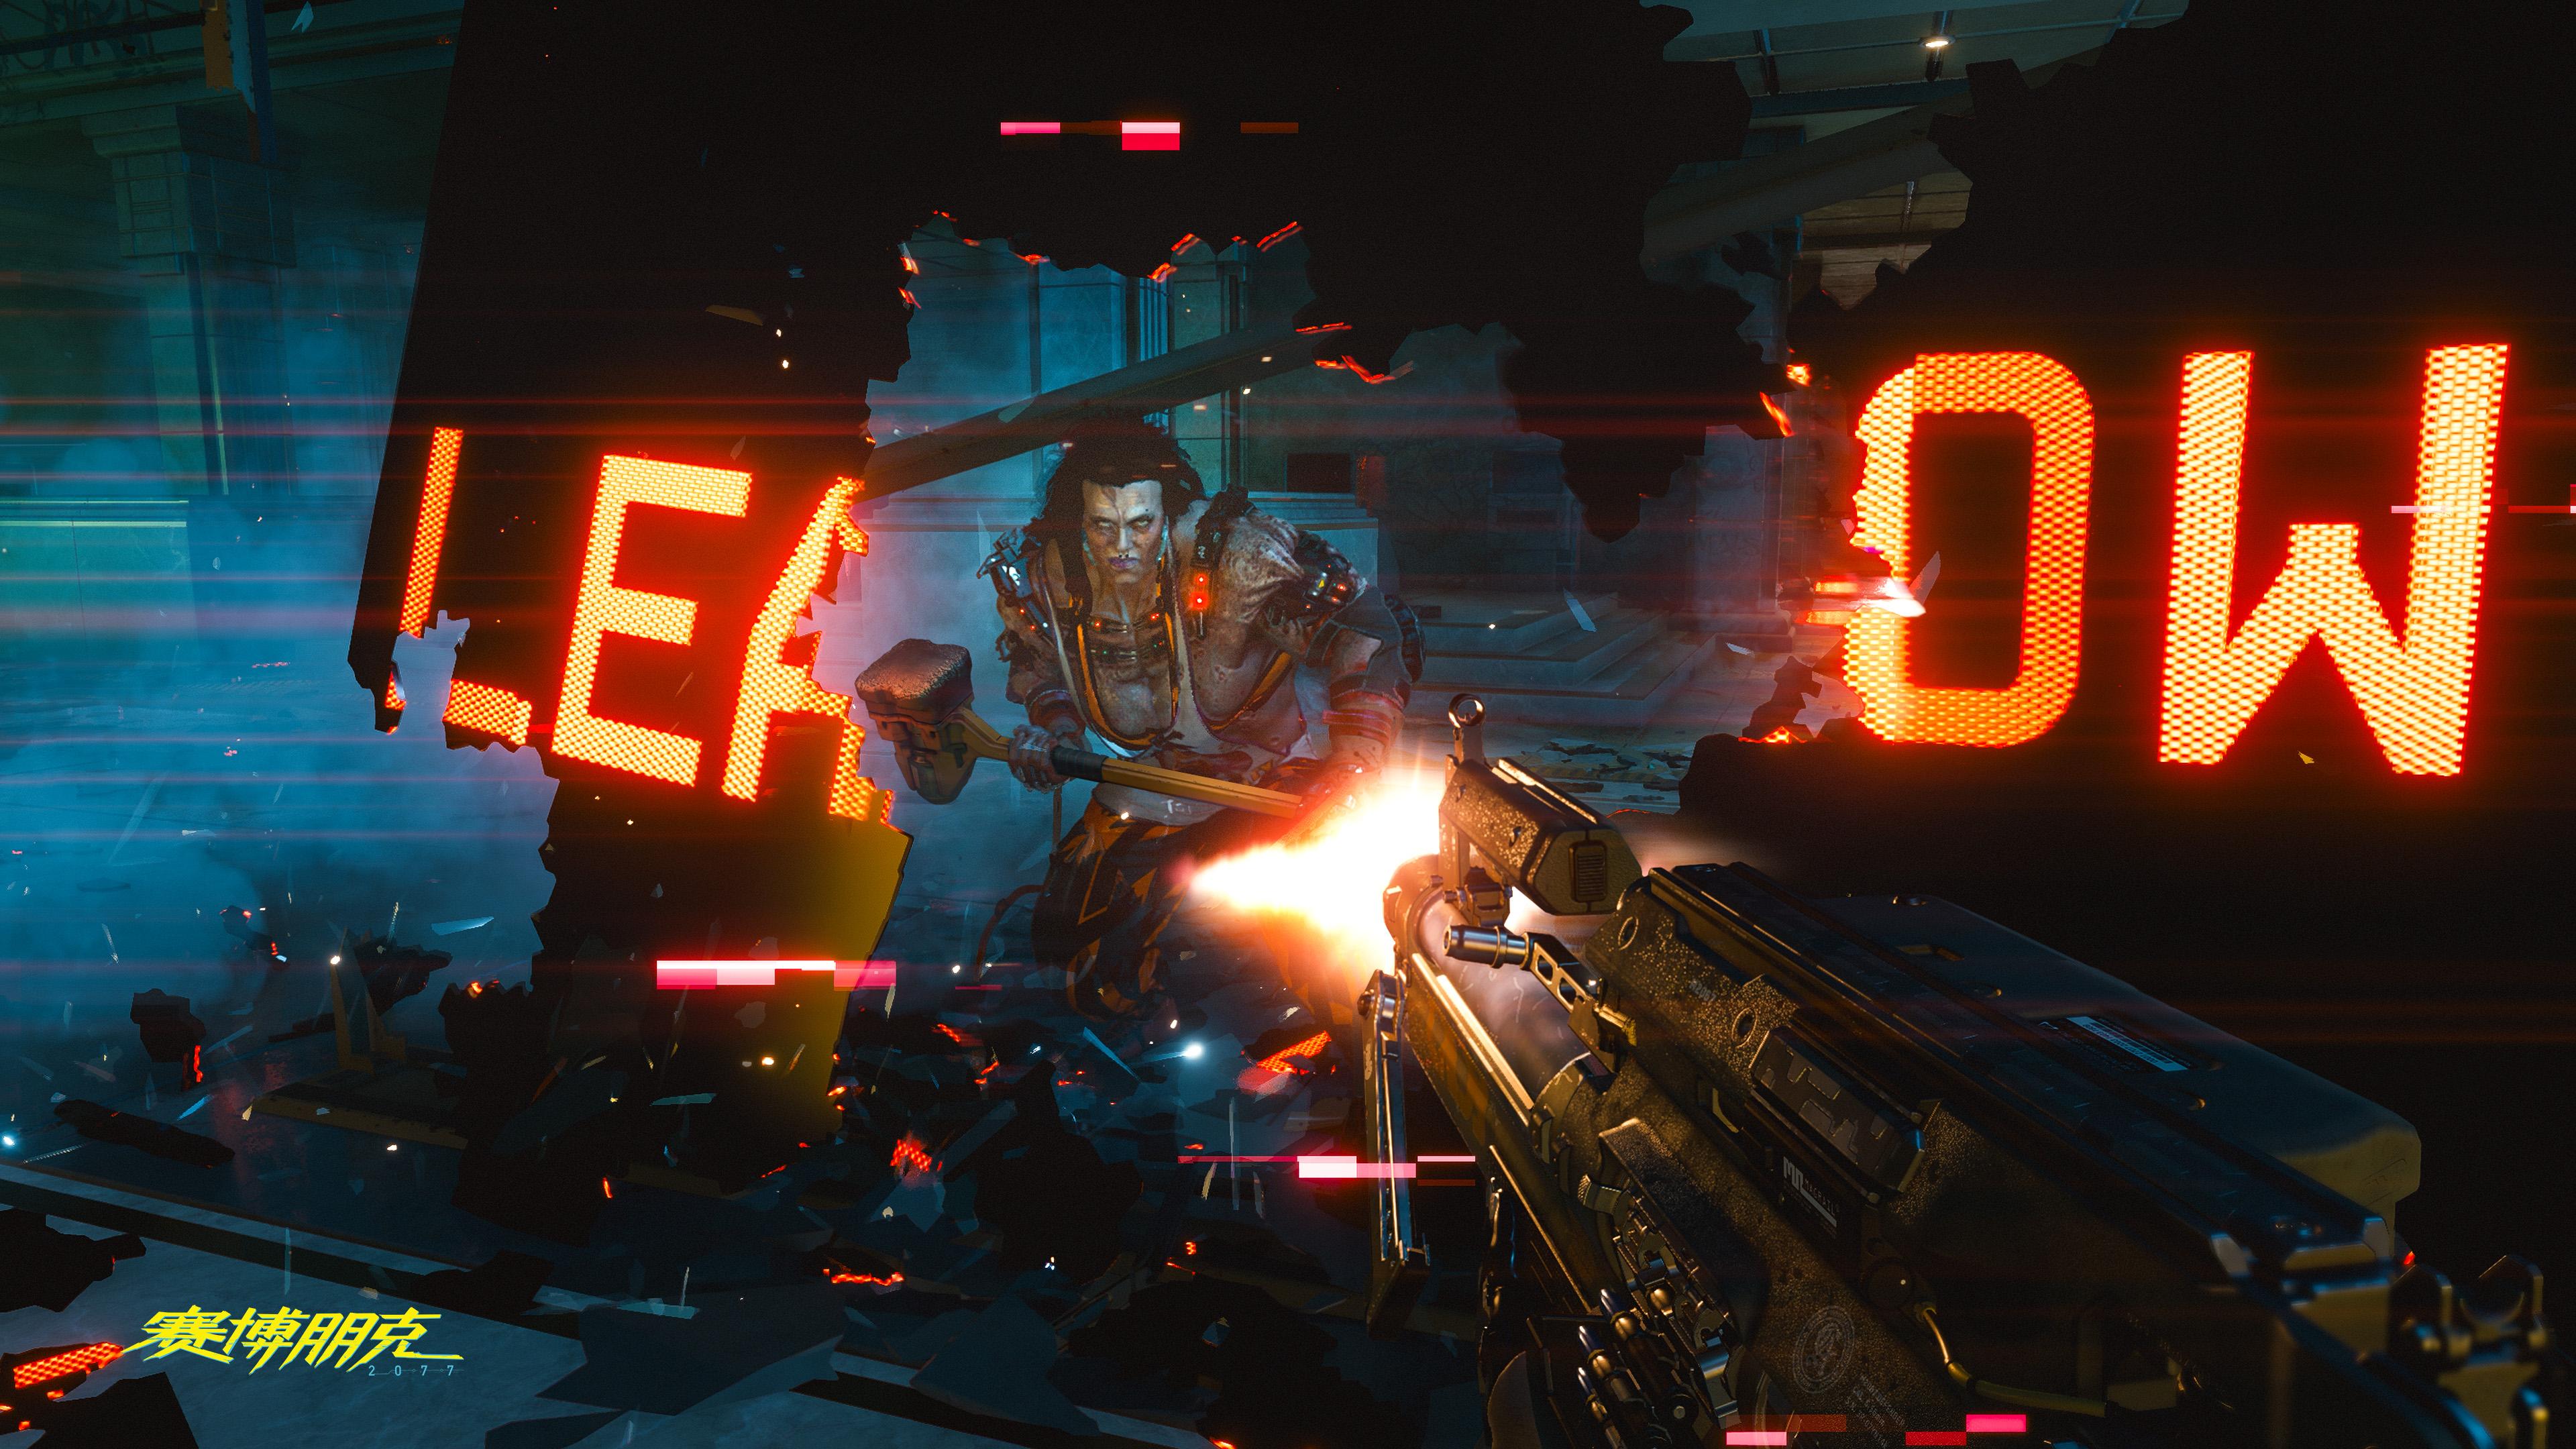 Cyberpunk 2077 จะมีโหมด Multiplayer! CD PROJEKT RED ทวีตบอกเอง